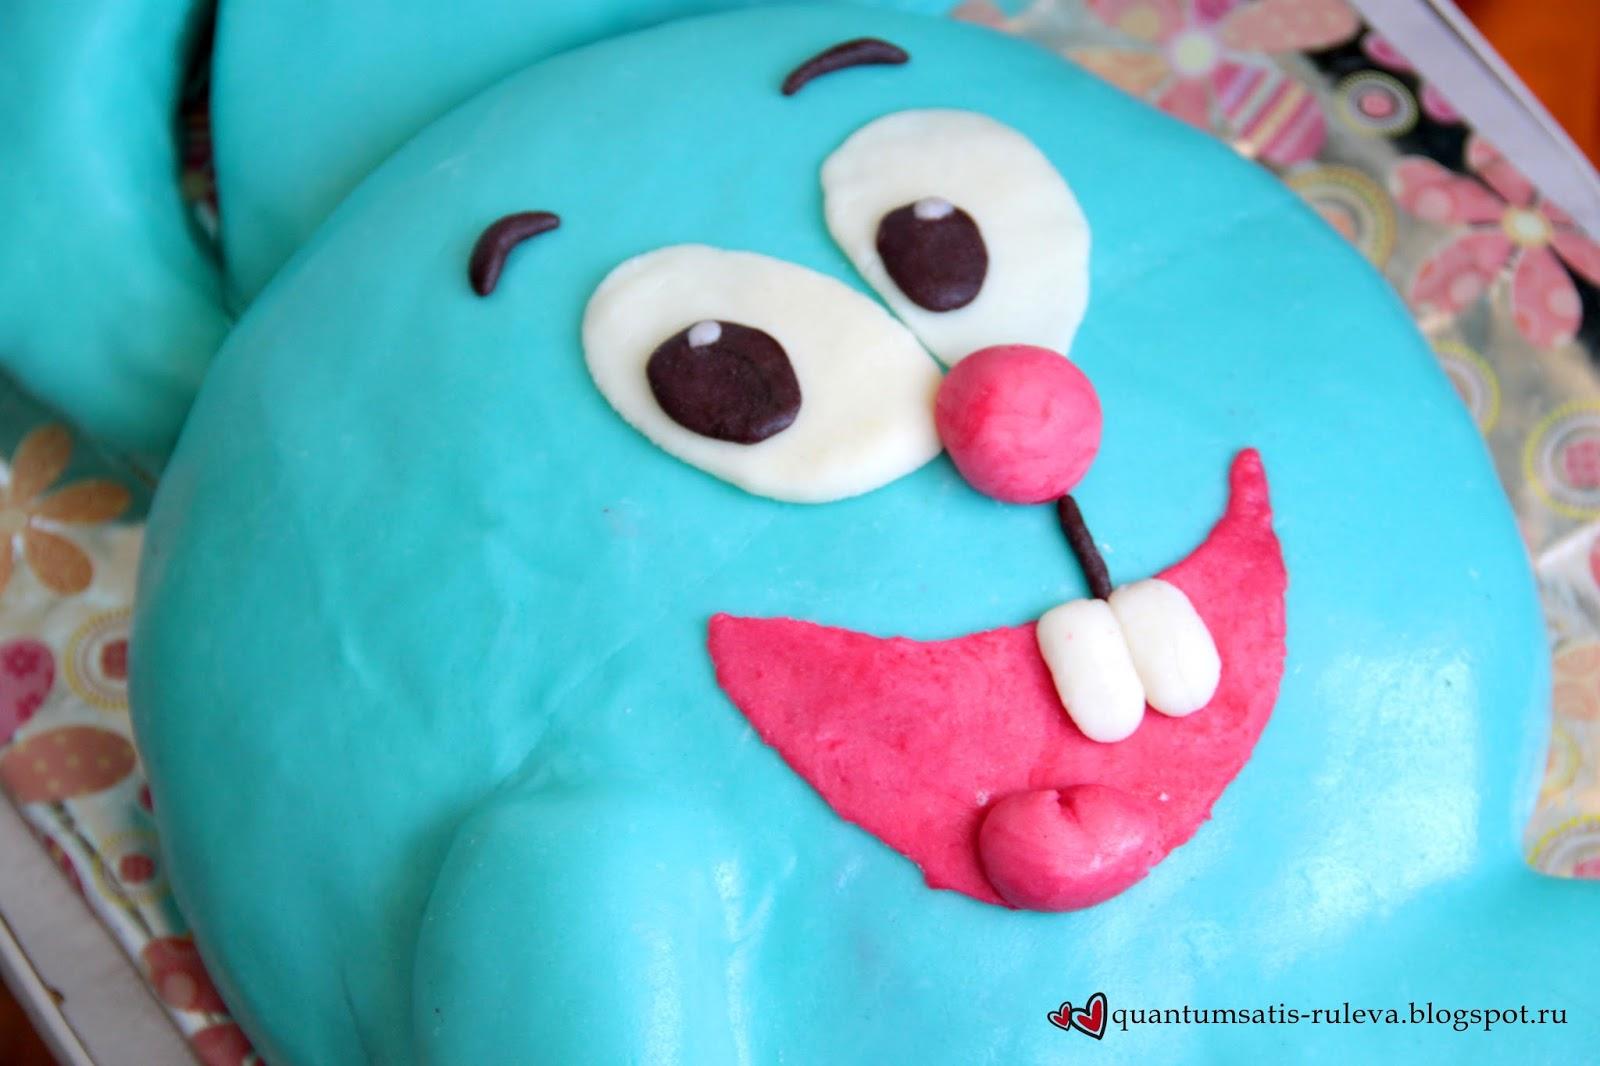 Как уложить мастику на торт в домашних условиях фото